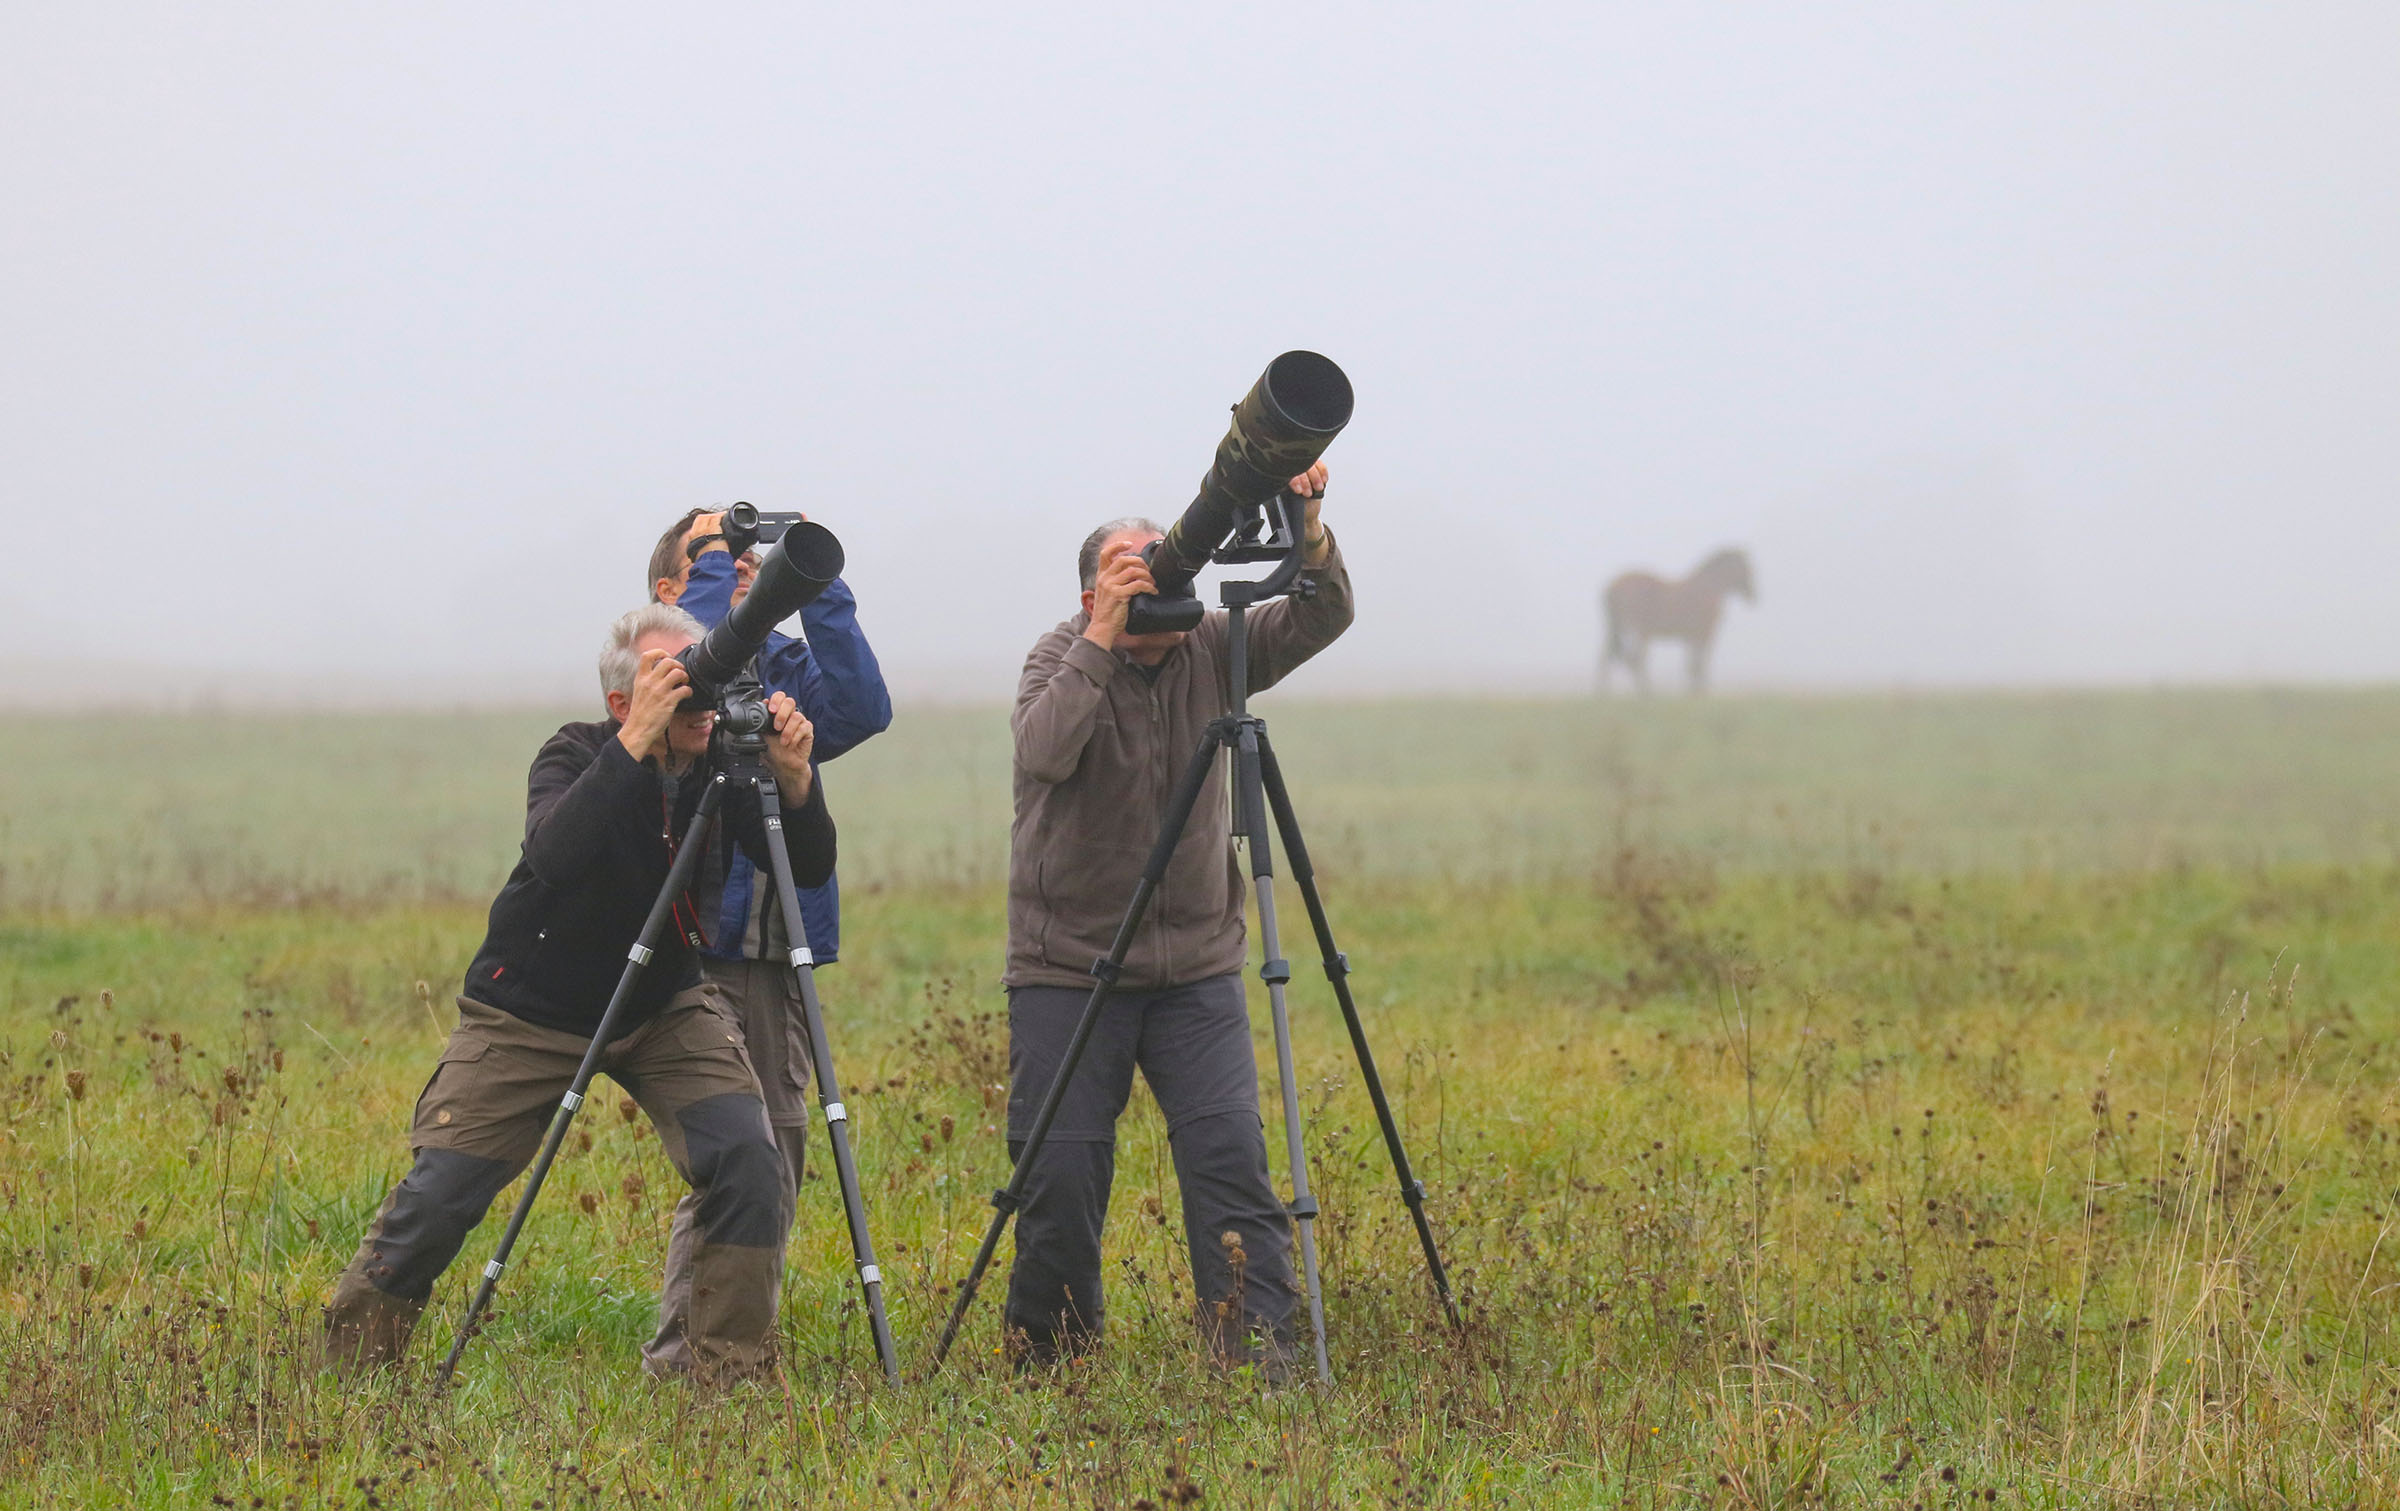 Gamtos fotografai | M. Karlono nuotr.